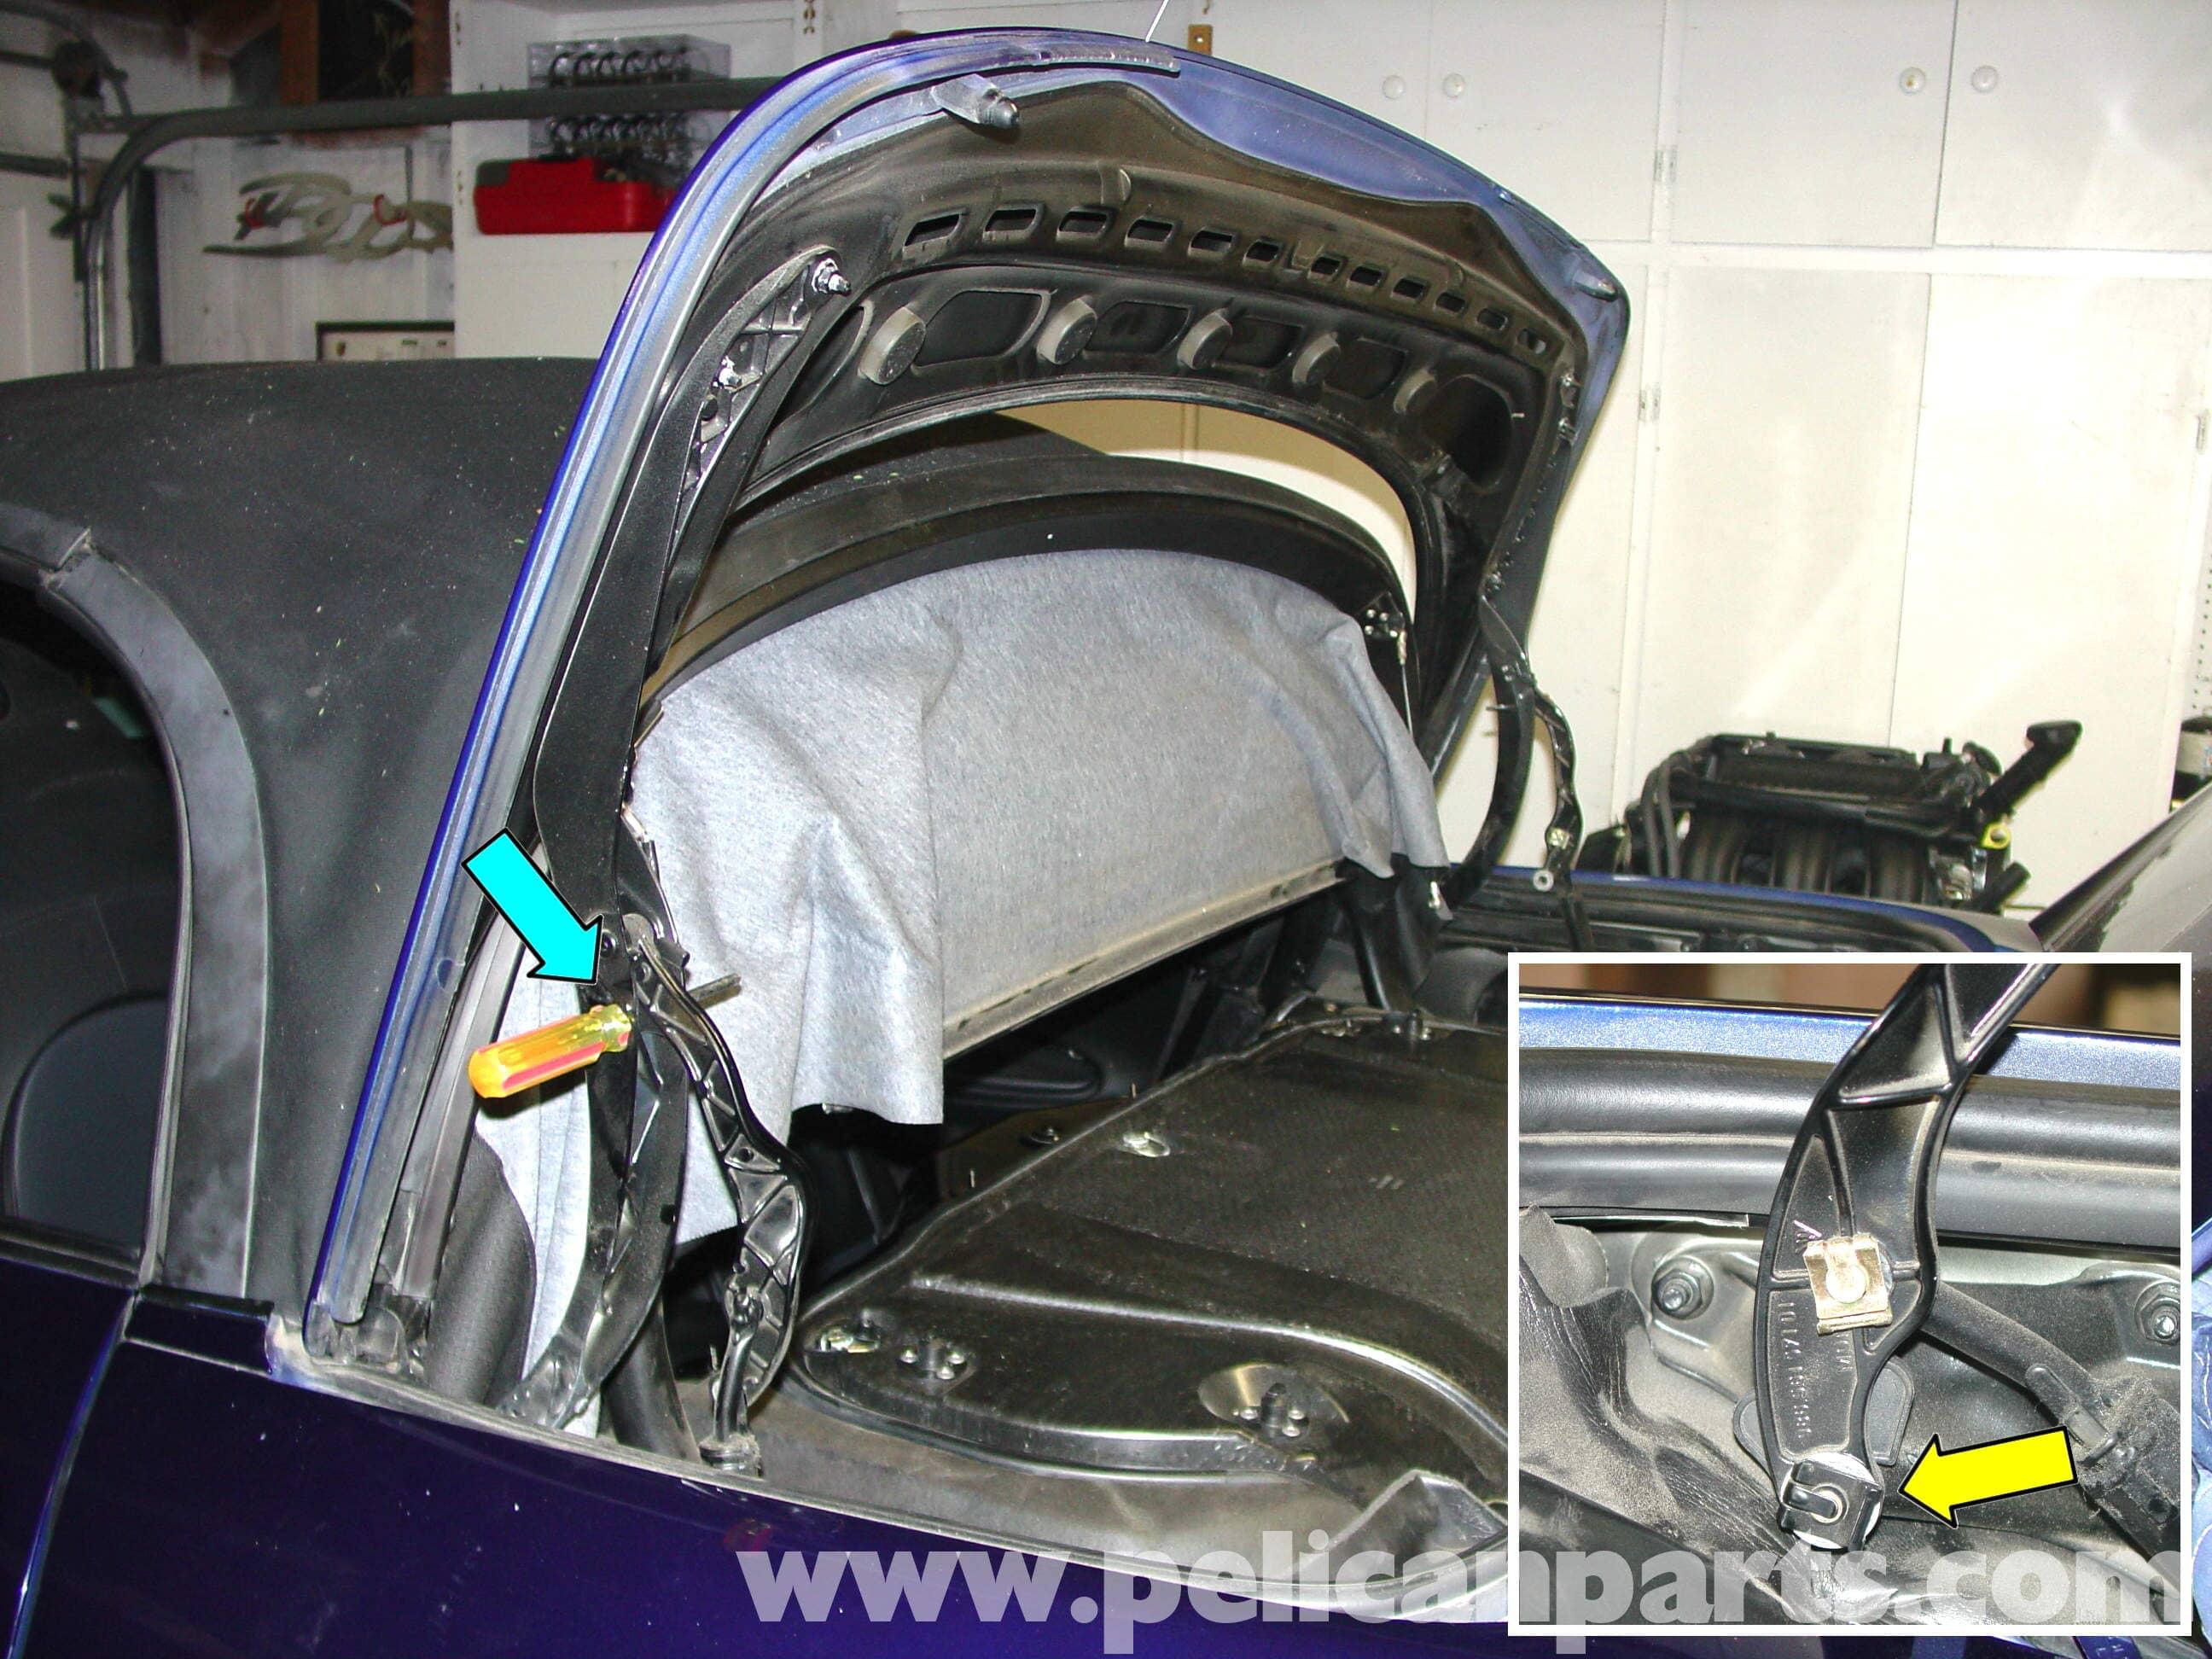 Porsche boxster engine compartment access